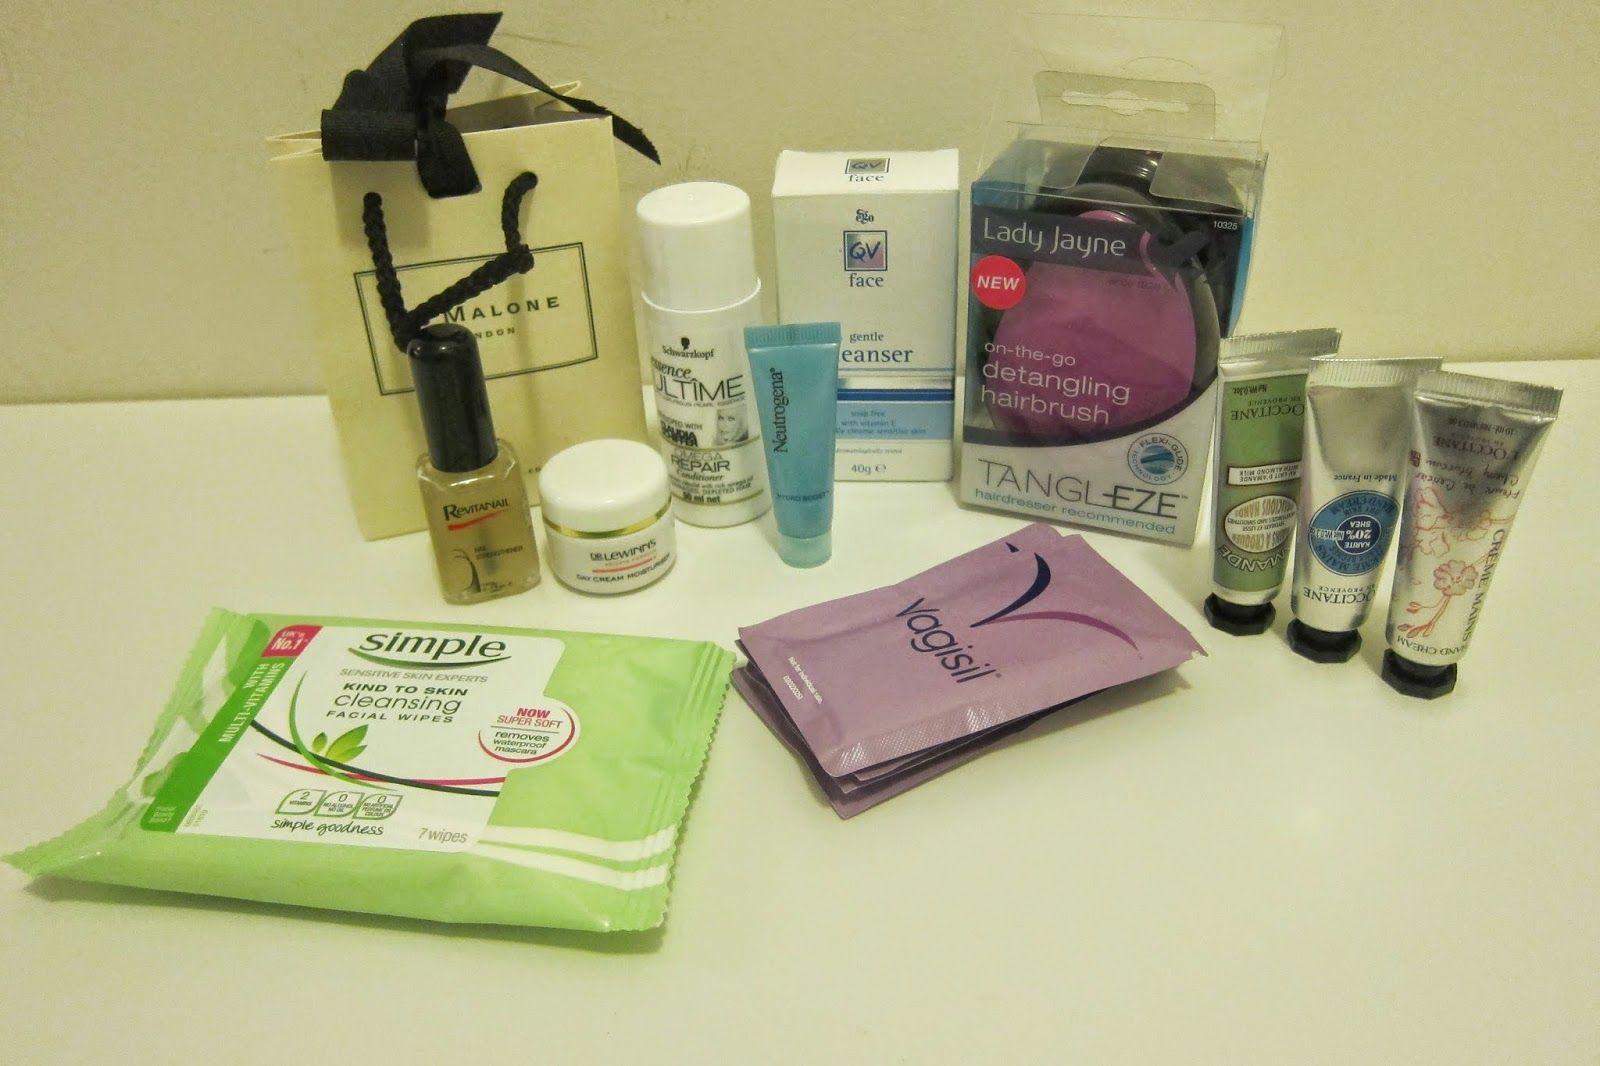 Australian Makeup and Skin care Free Samples Skin care